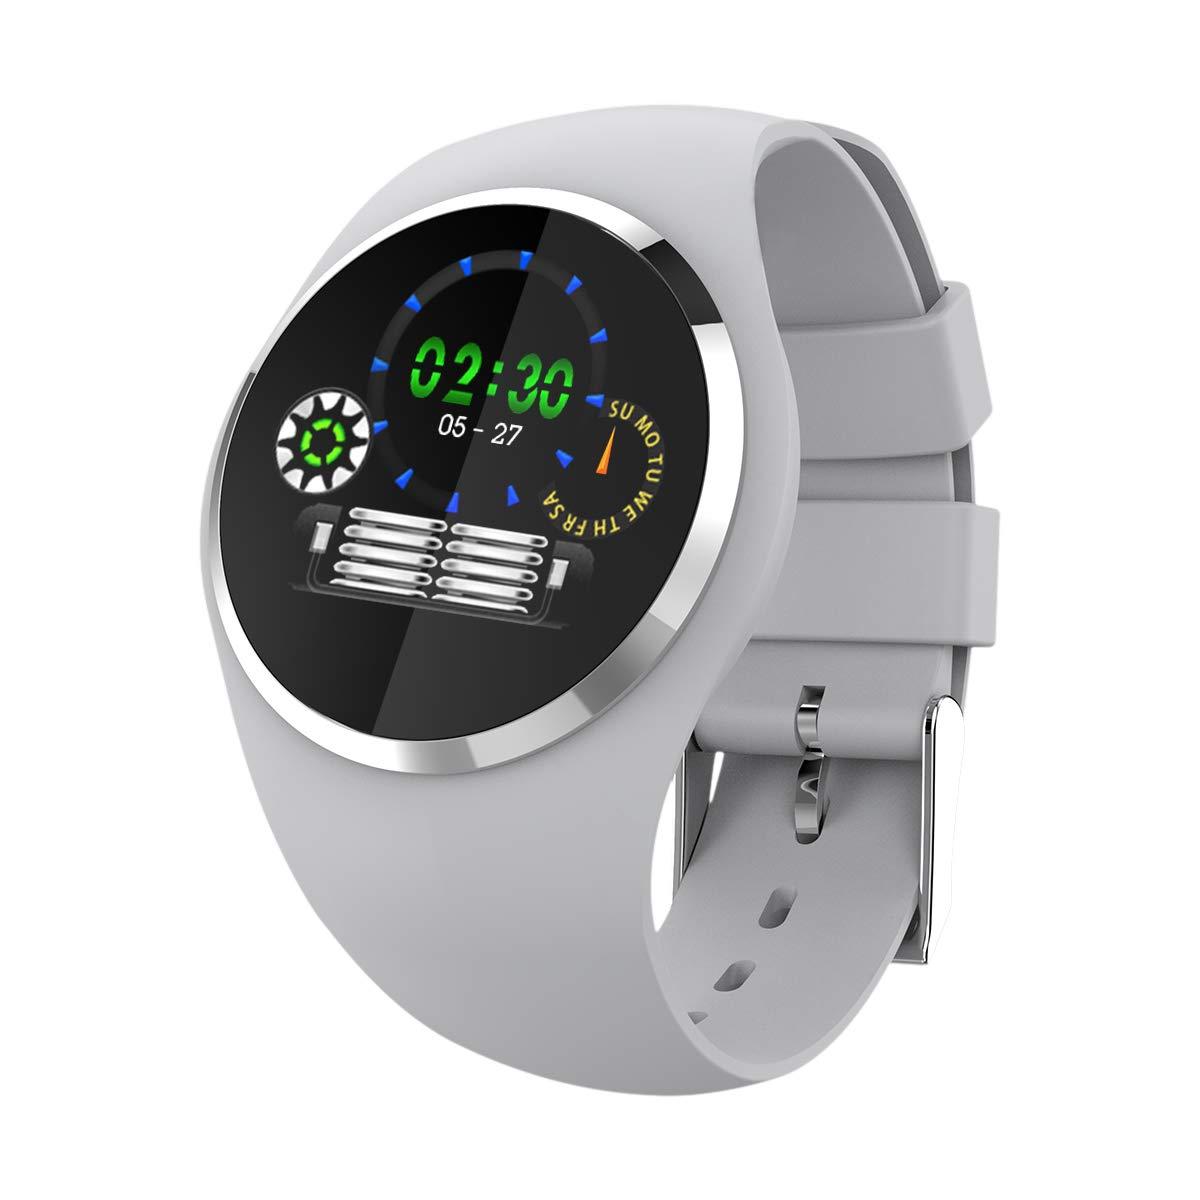 Amazon.com: Nubai X6 Bluetooth Smart Watch for iPhones and ...